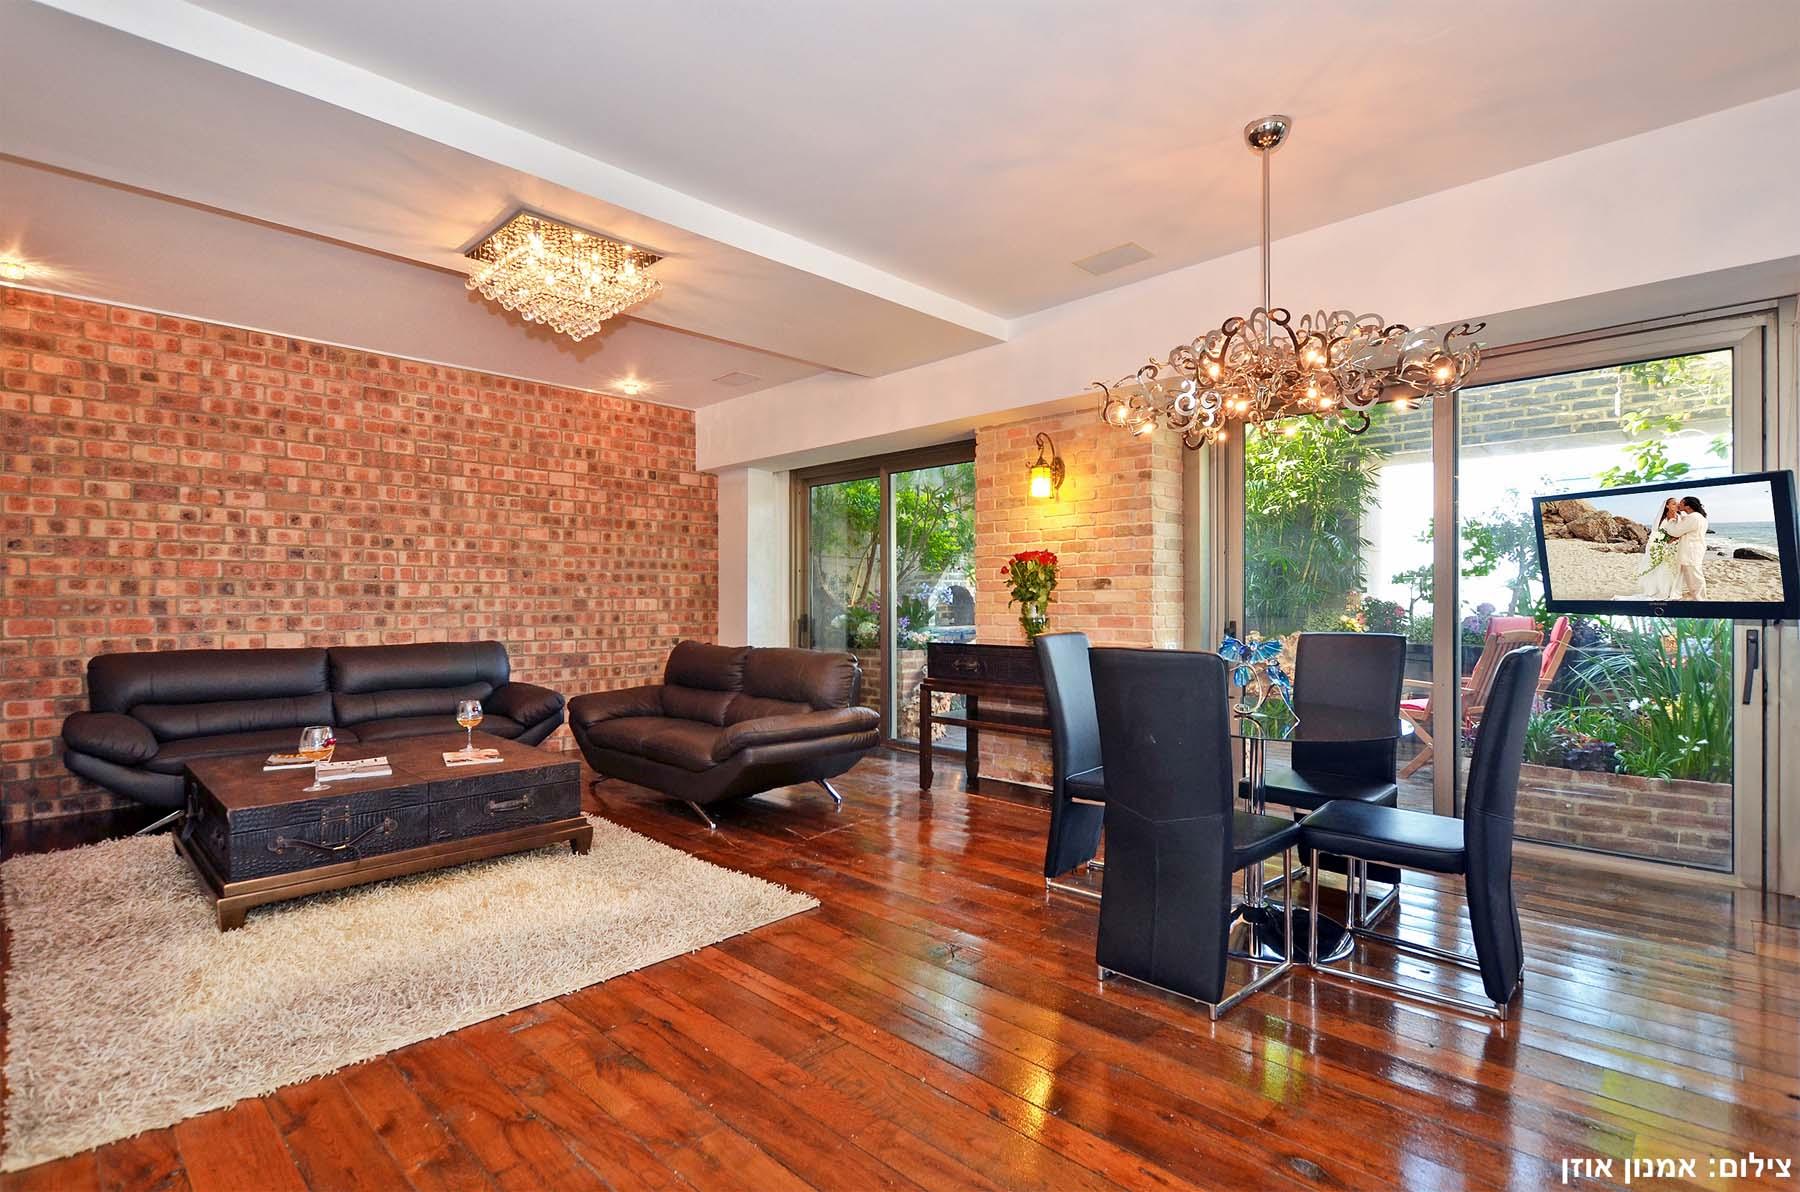 Appartement pour l Vente à European Style Luxury Apartment in Leonardo City Tower Ramat Gan, Israel Israël